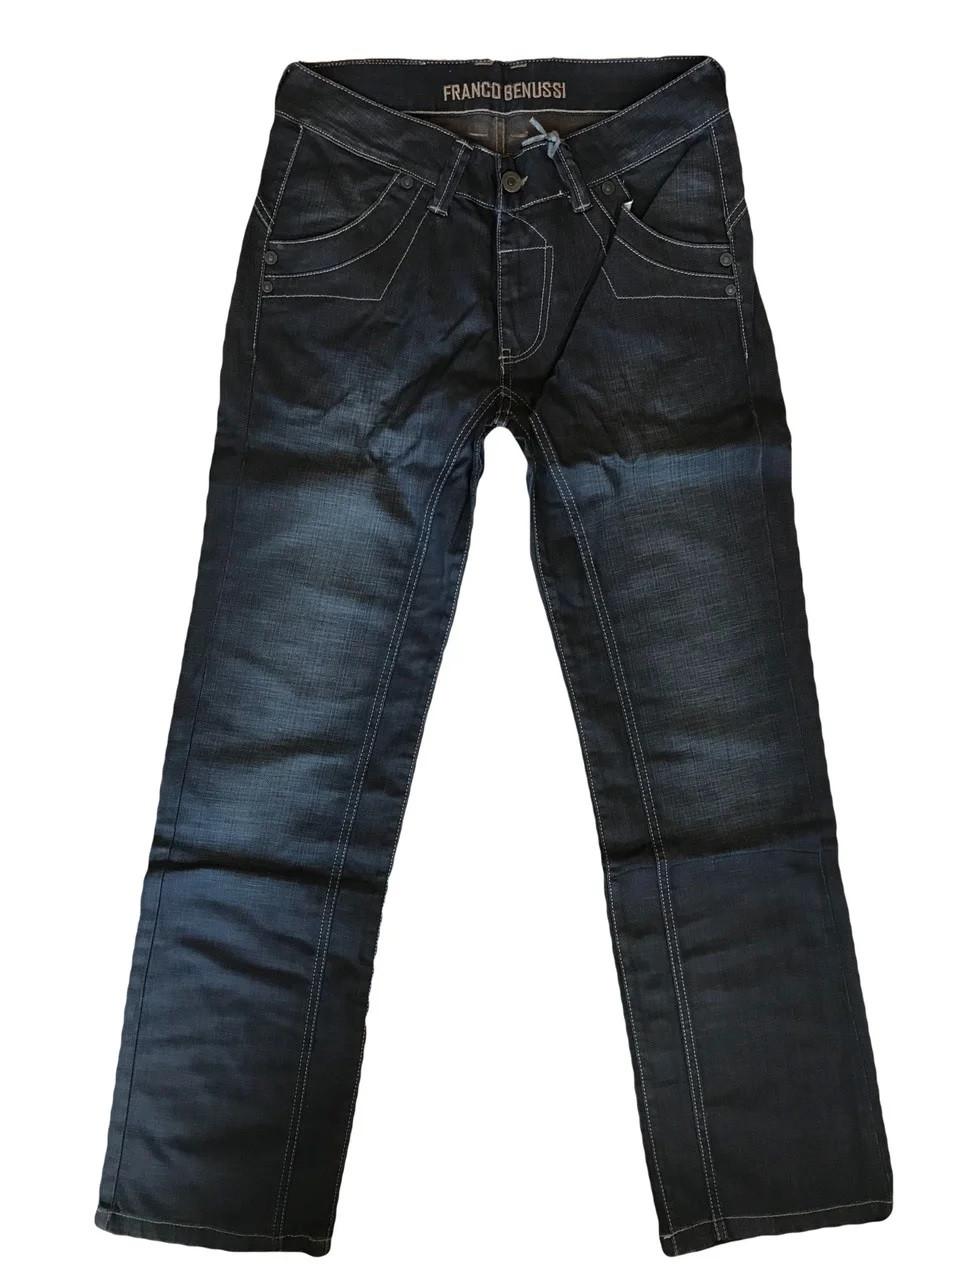 Джинсы мужские Franco Benussi FB 1235 темно-синие